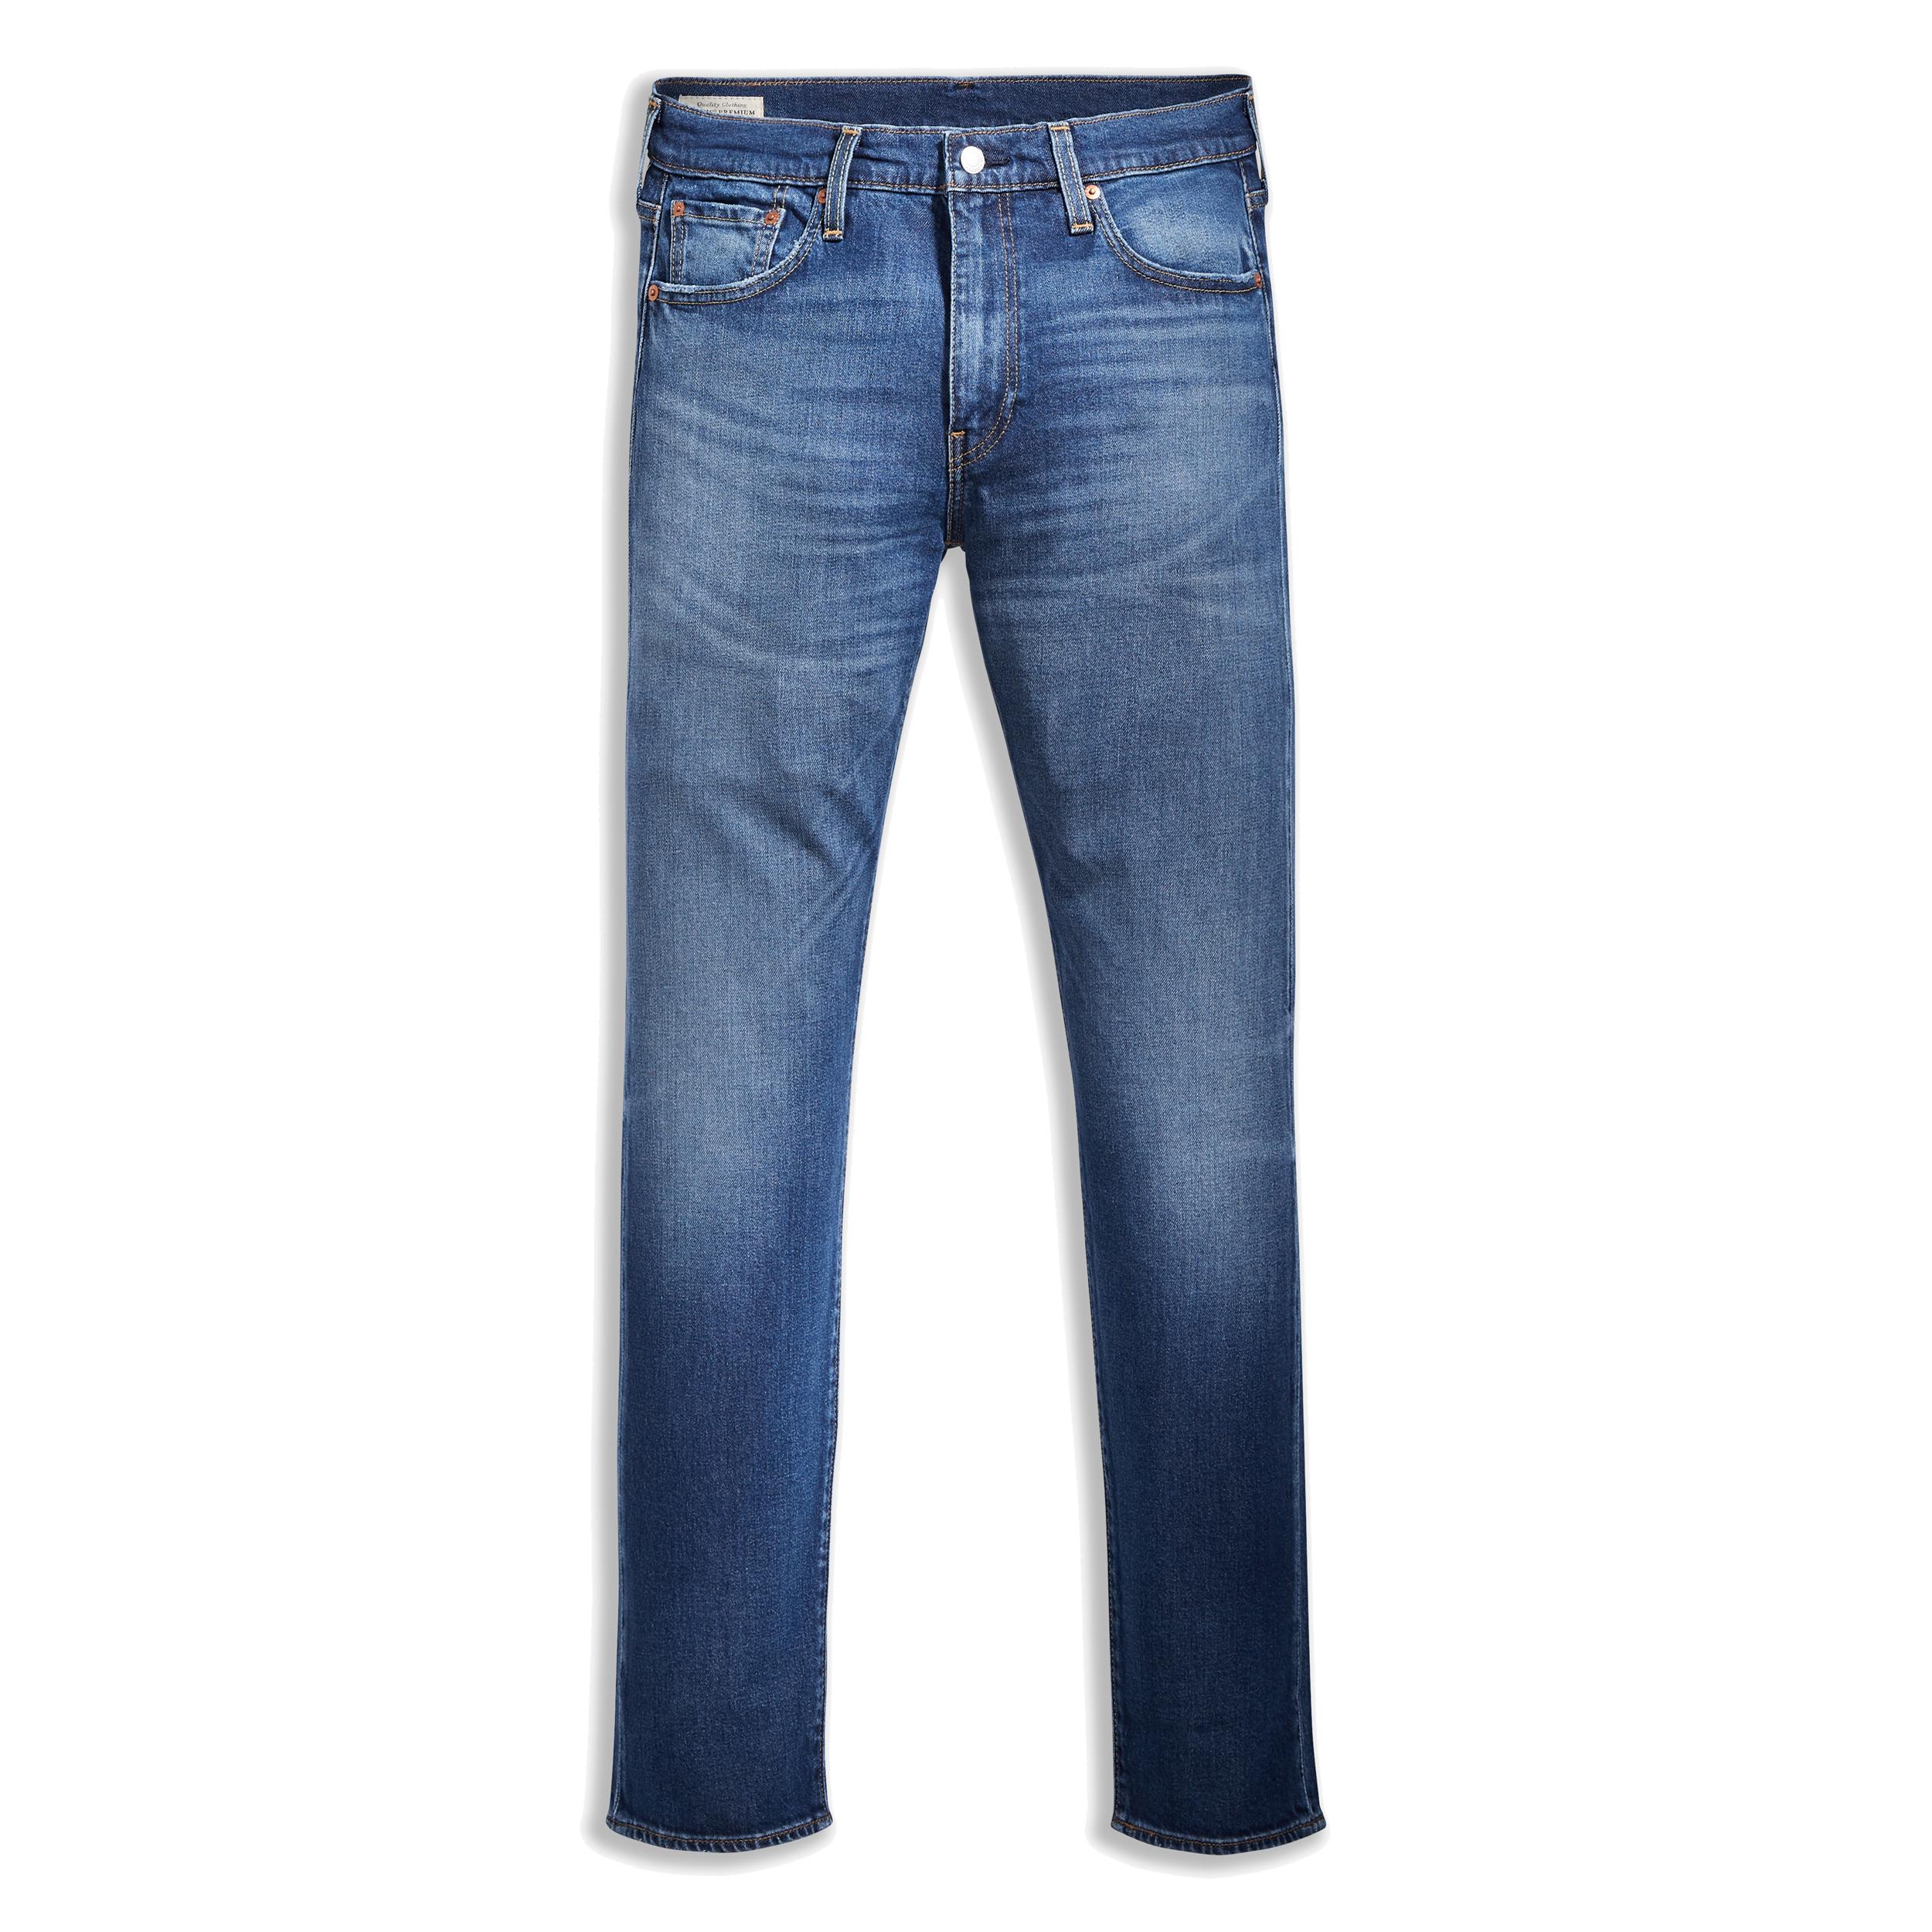 Jean Levi's 502 bleu en coton